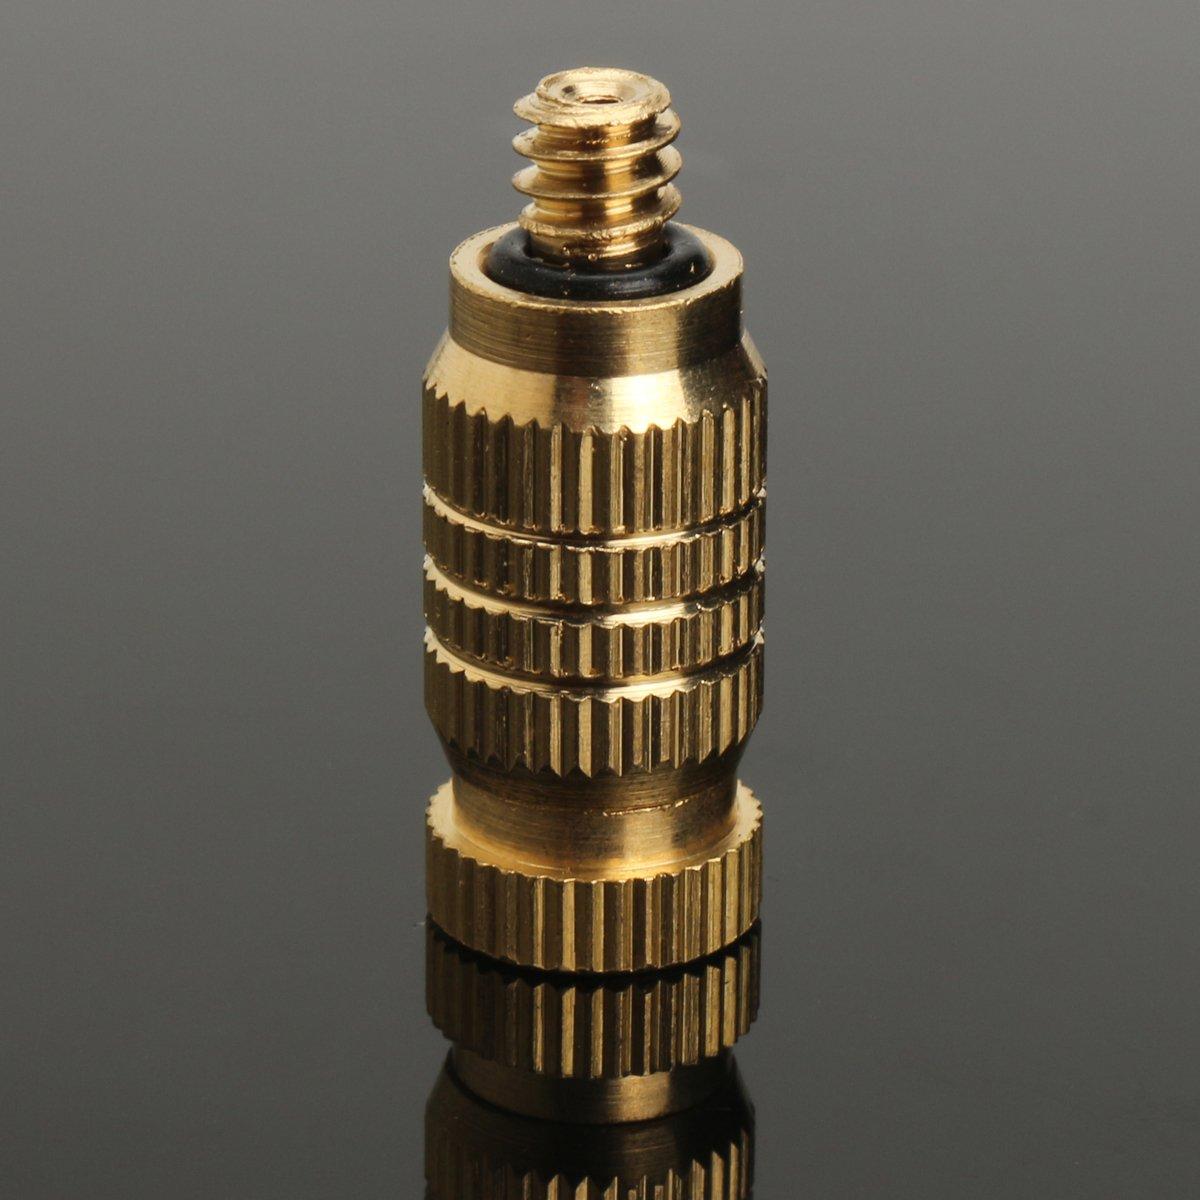 10Pcs 4mm Male Threaded Brass Misting Fogging Nozzle Spray Sprinkler Head Irrigation Cooling by Ologymart (Image #4)